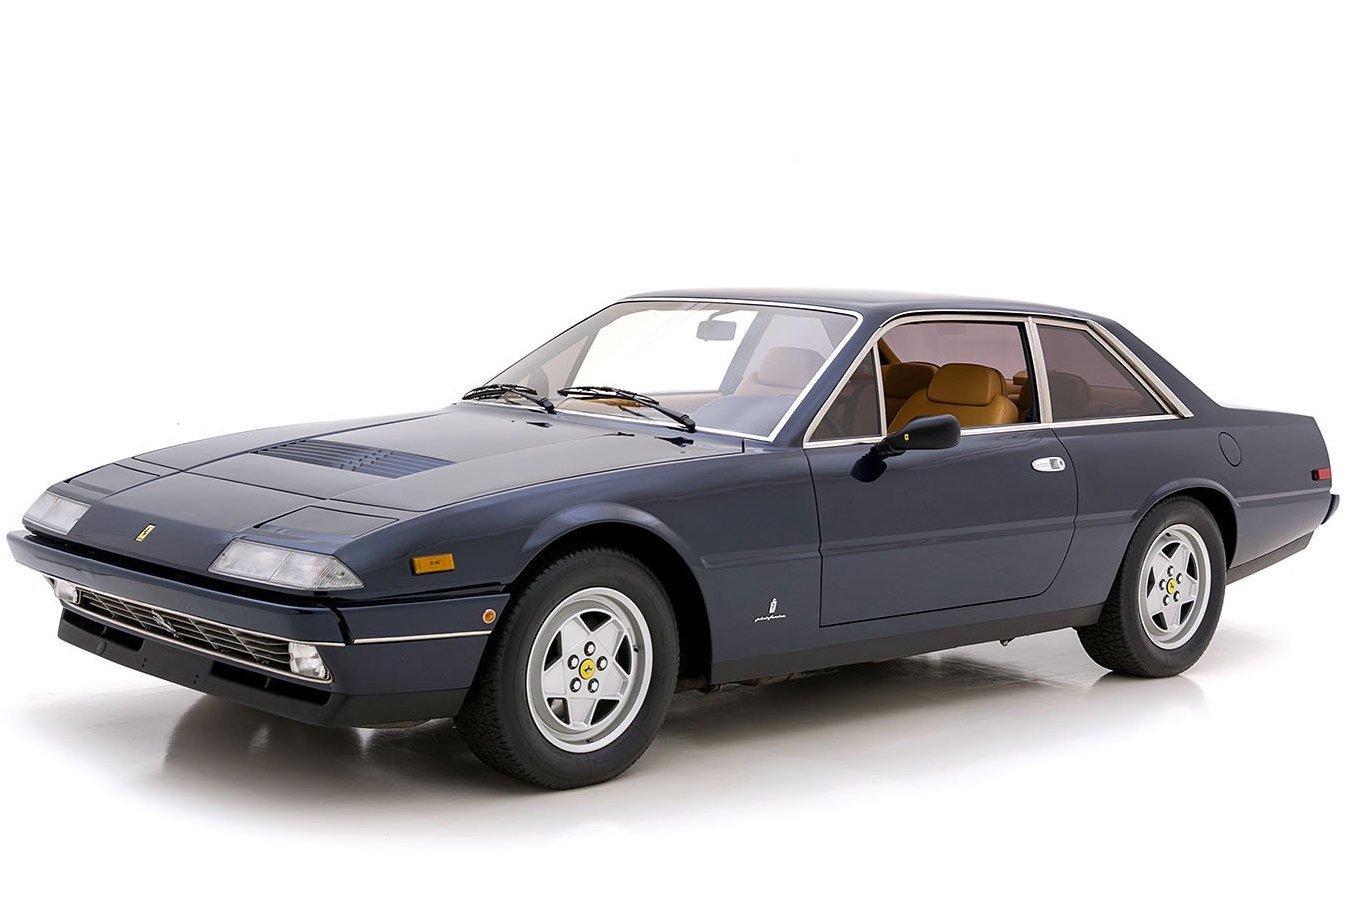 1987 Ferrari 412 For Sale | Vintage Driving Machines